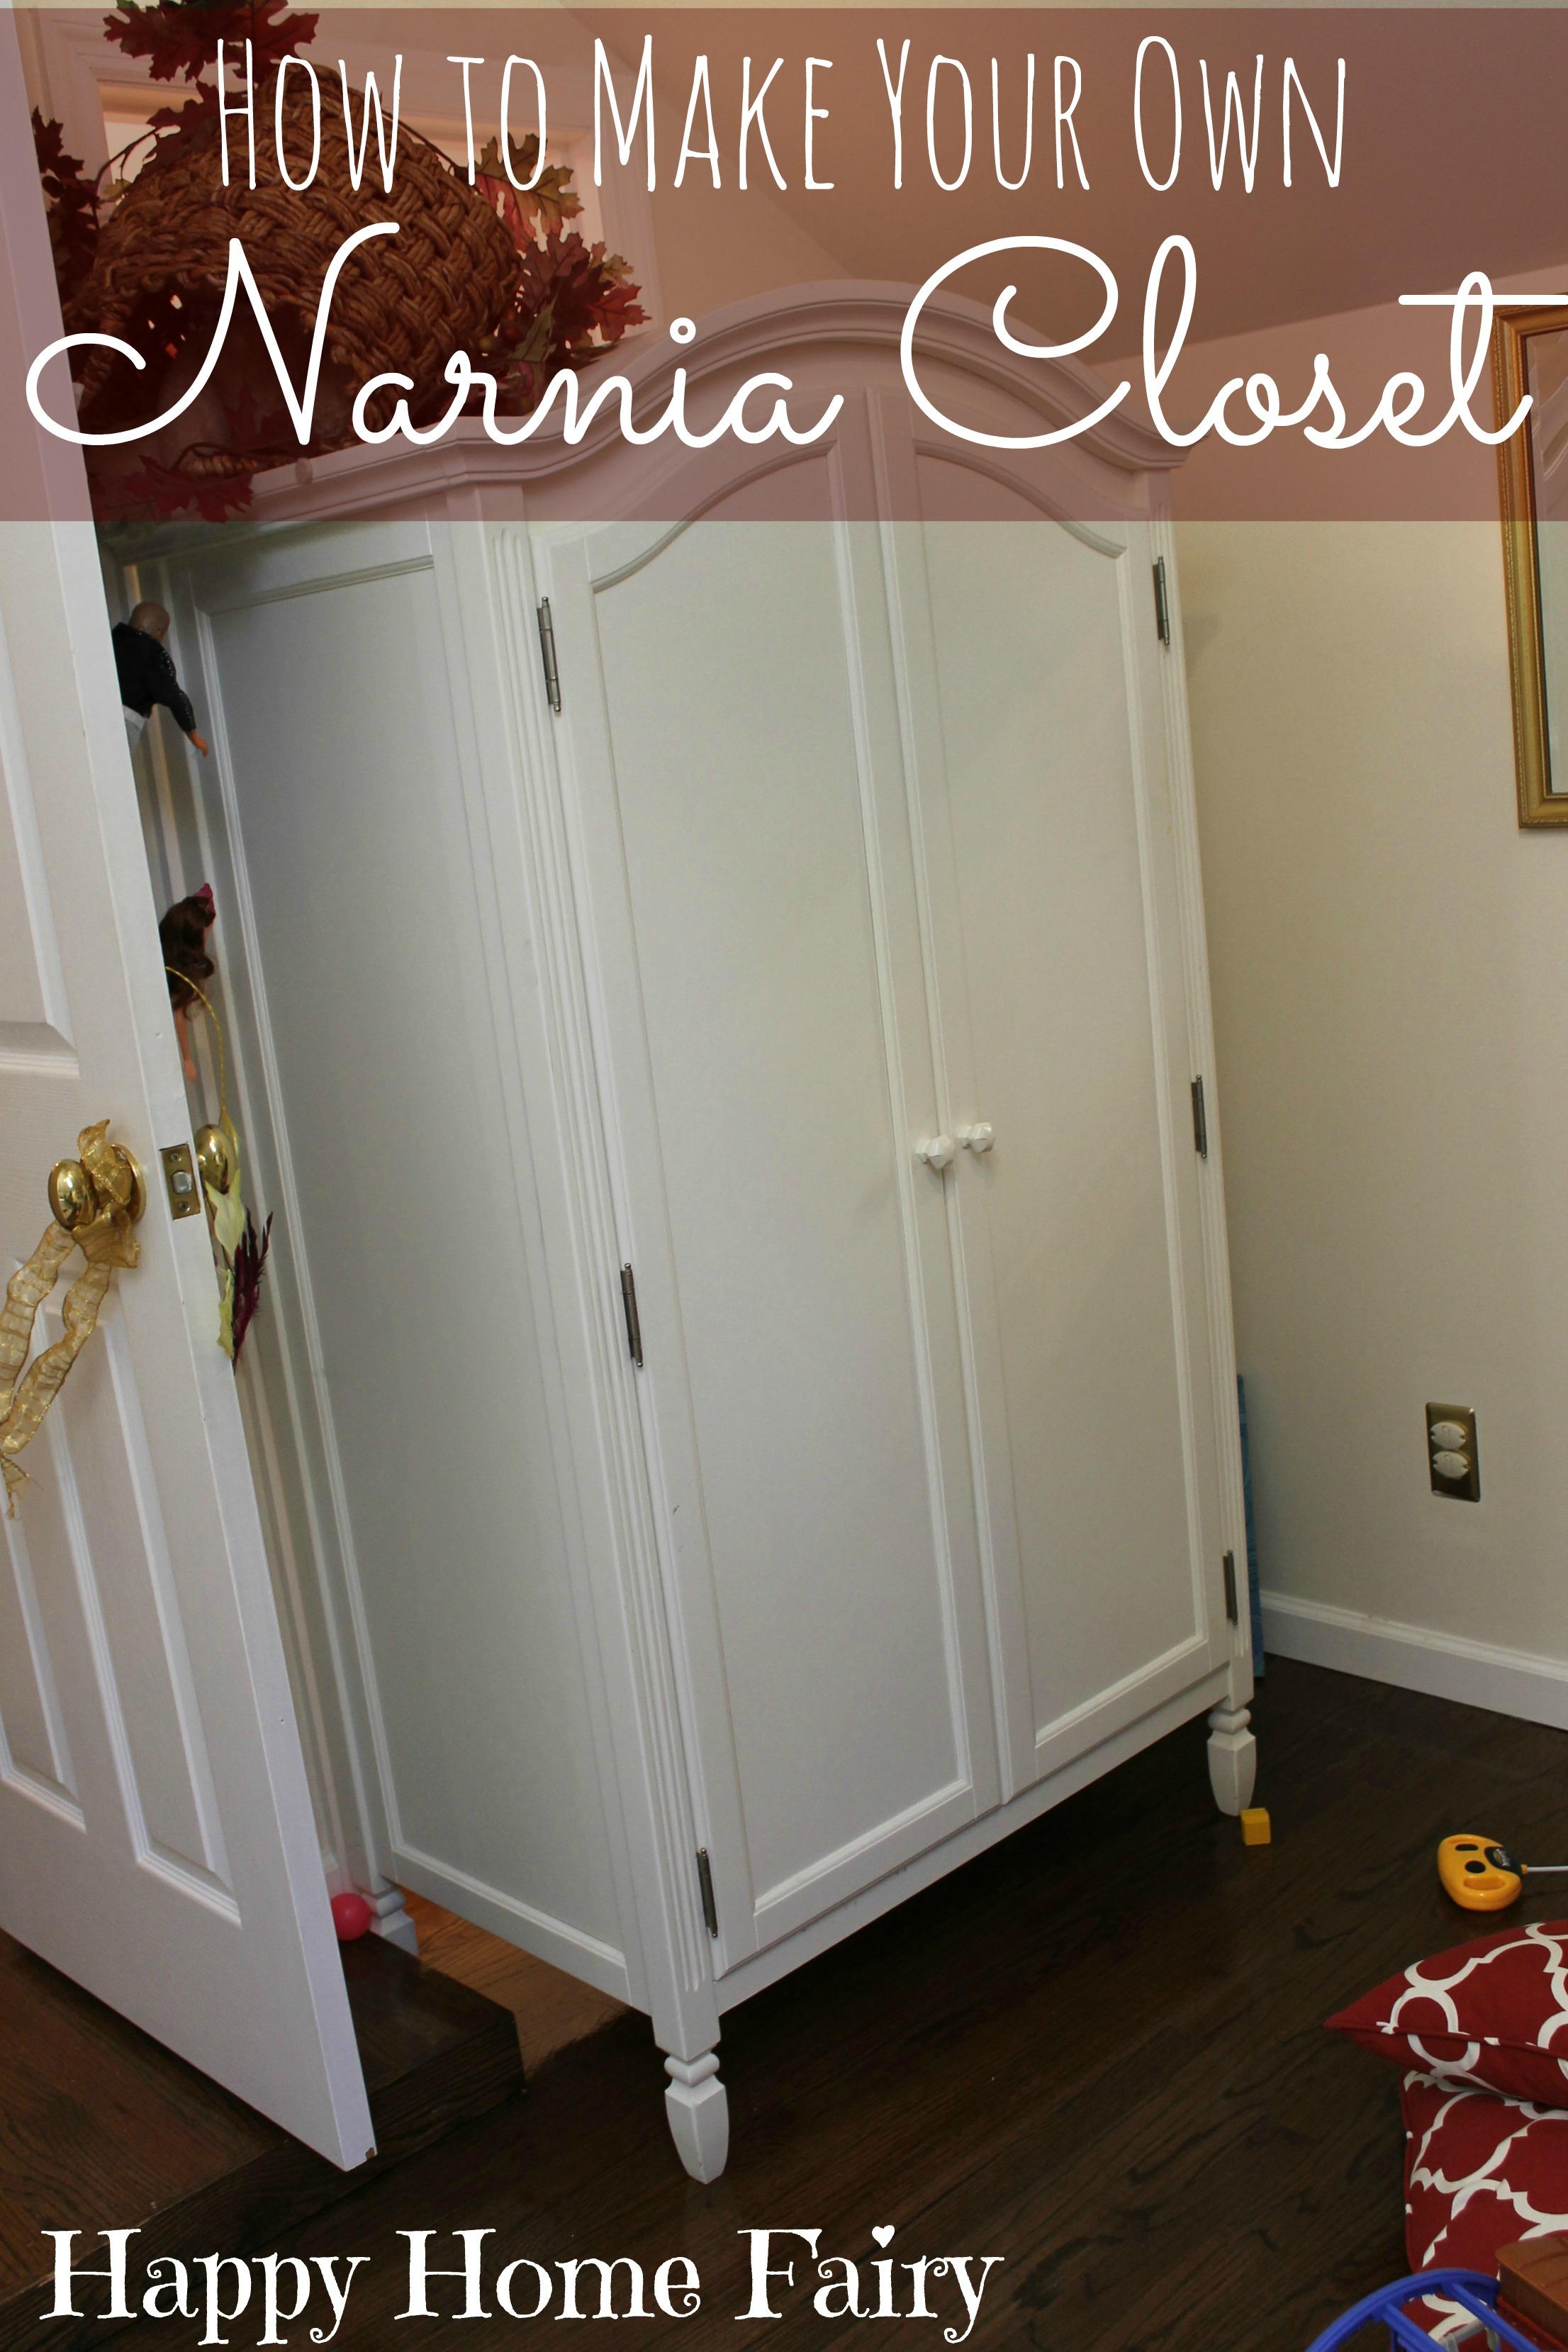 How To Make A Narnia Closet Happy Home Fairy